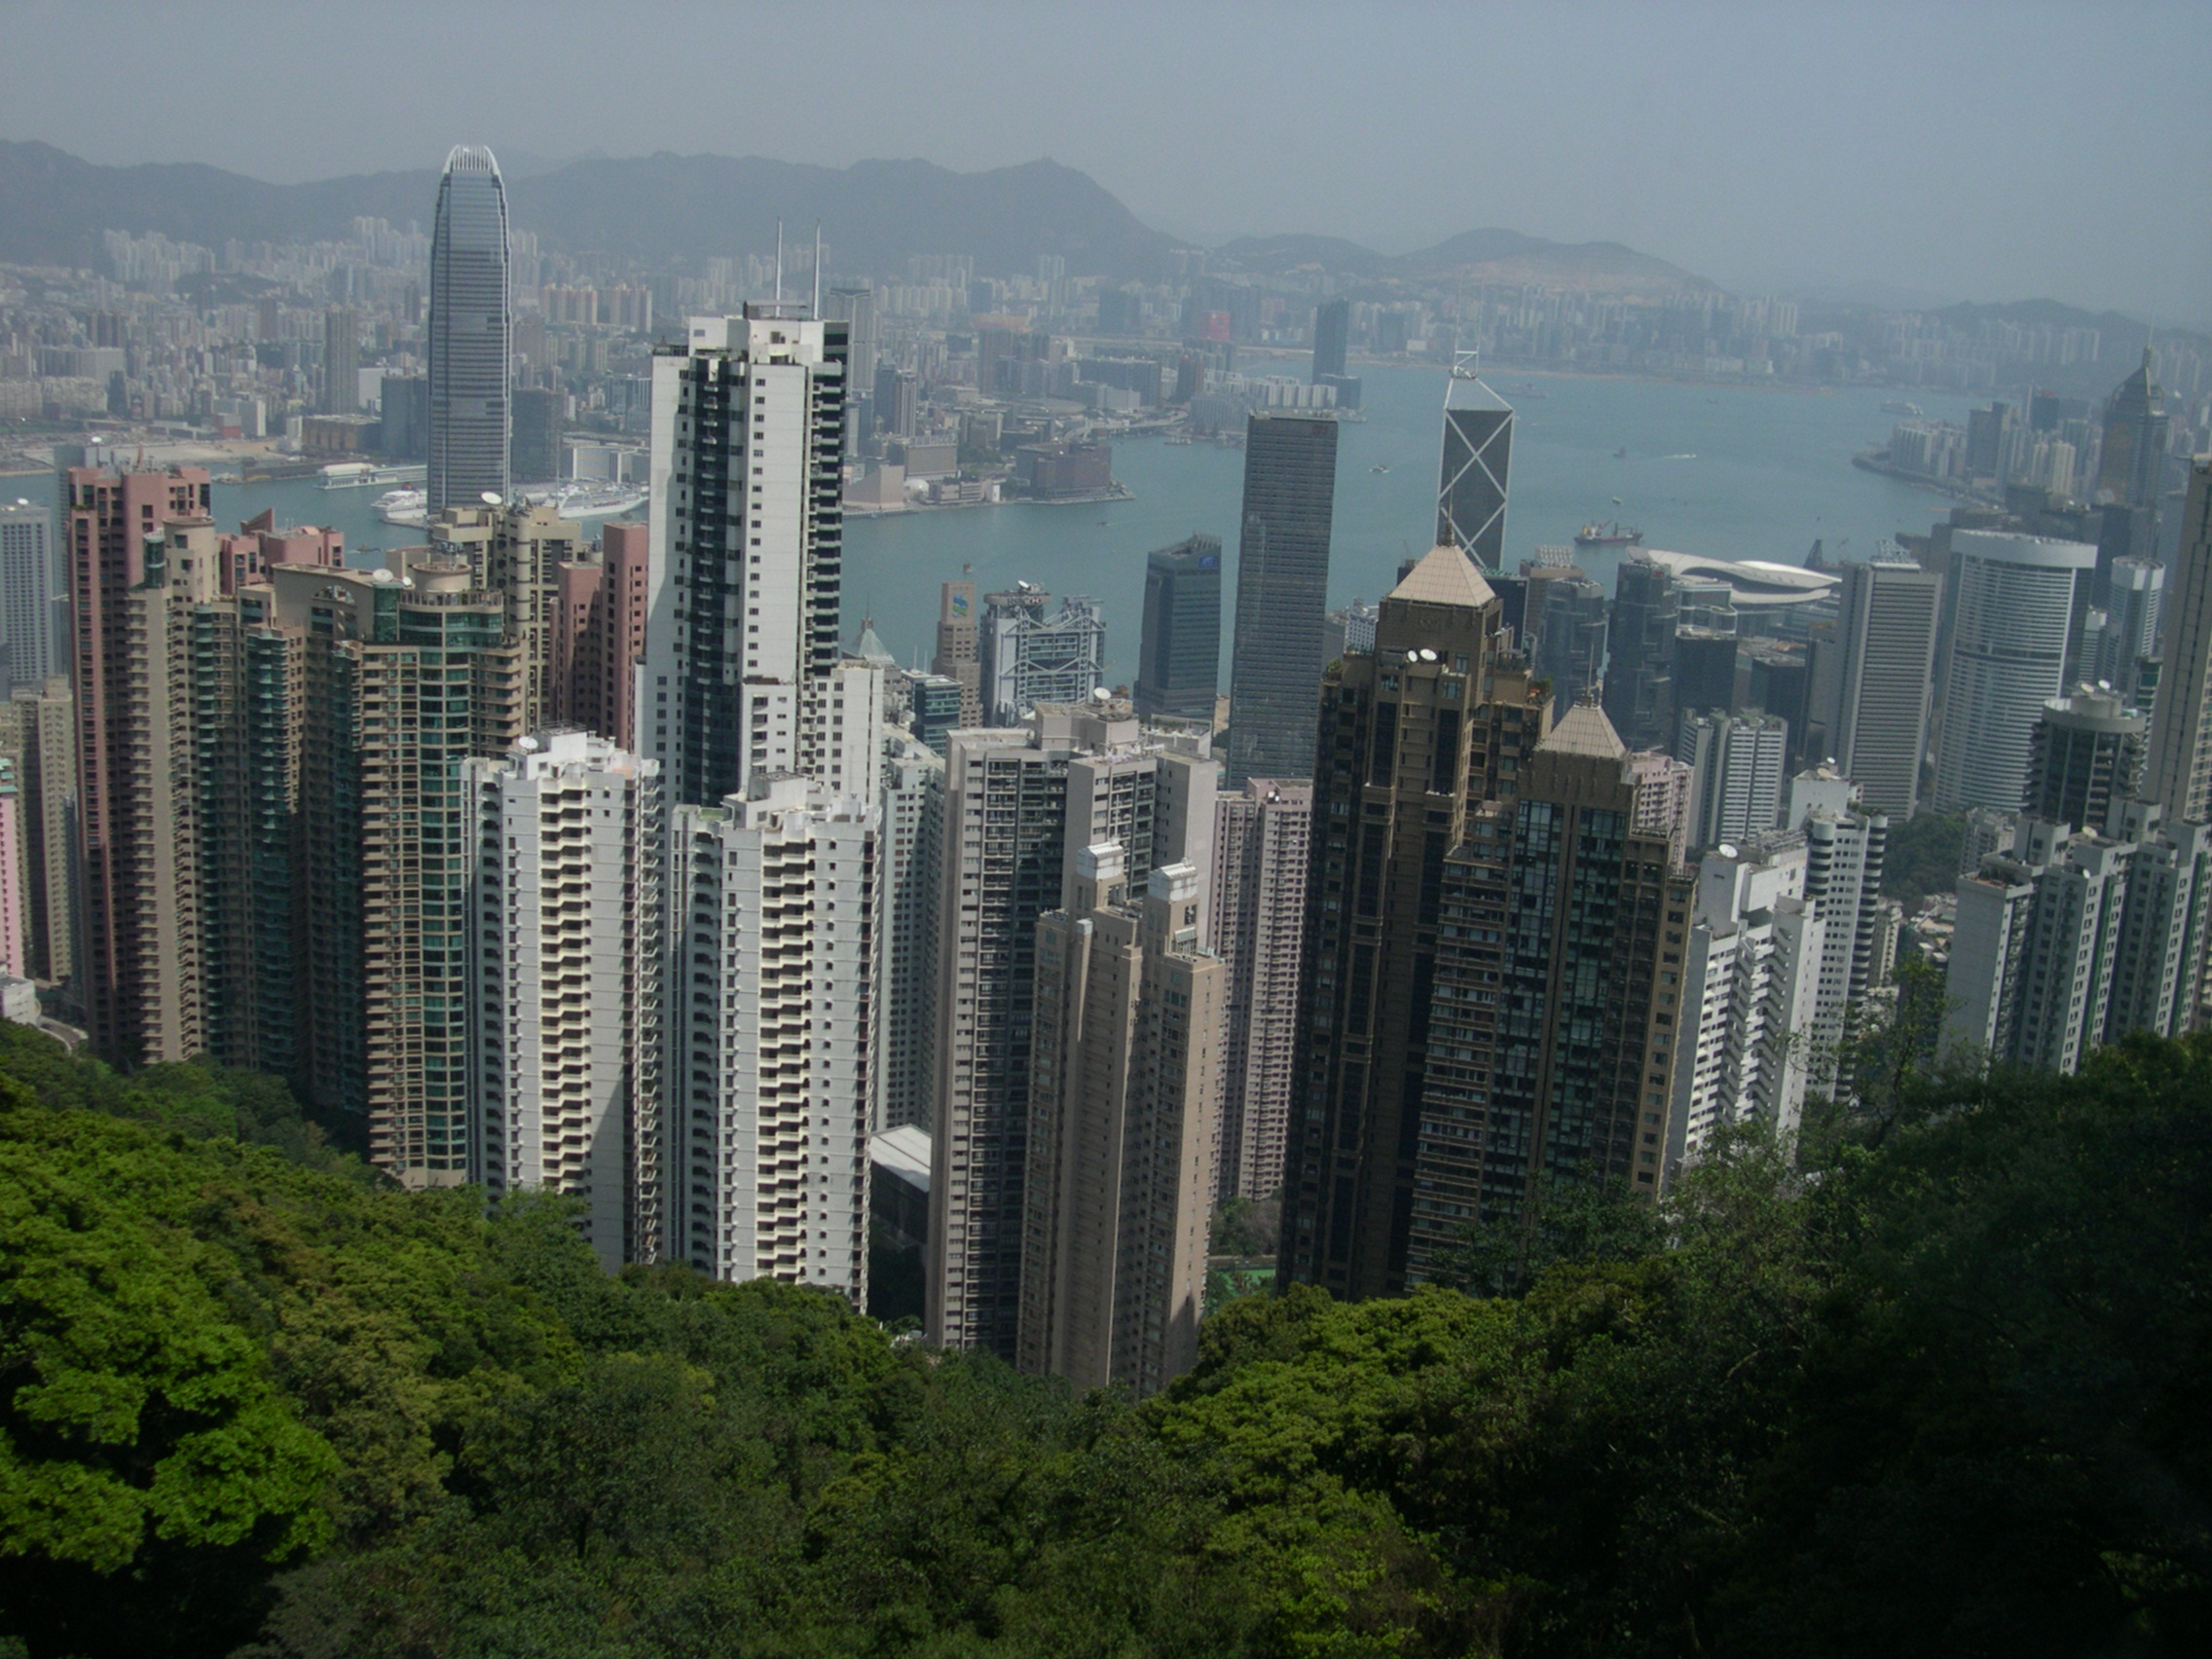 Views of Hong Kong from The Peak